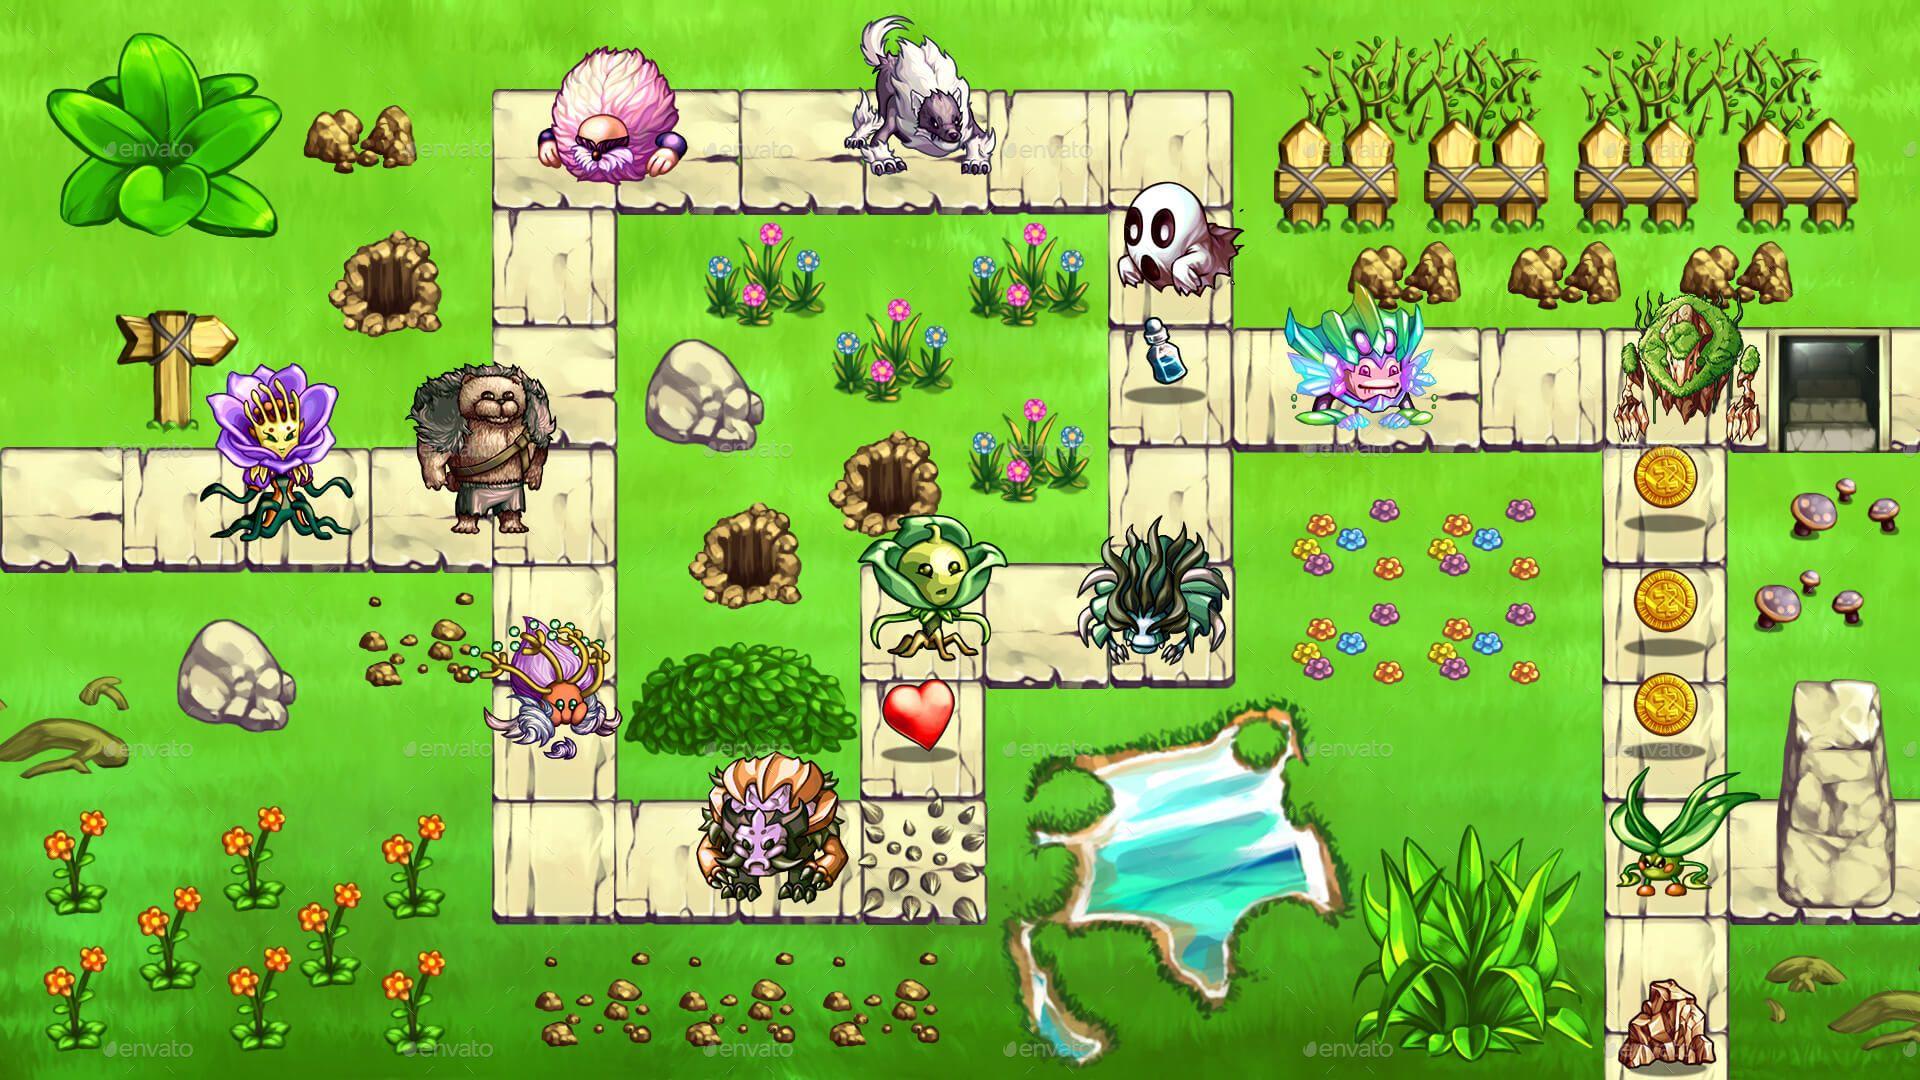 2D Platformer Cartoon Creatures Game Assets Bundle w Sprites #Ad